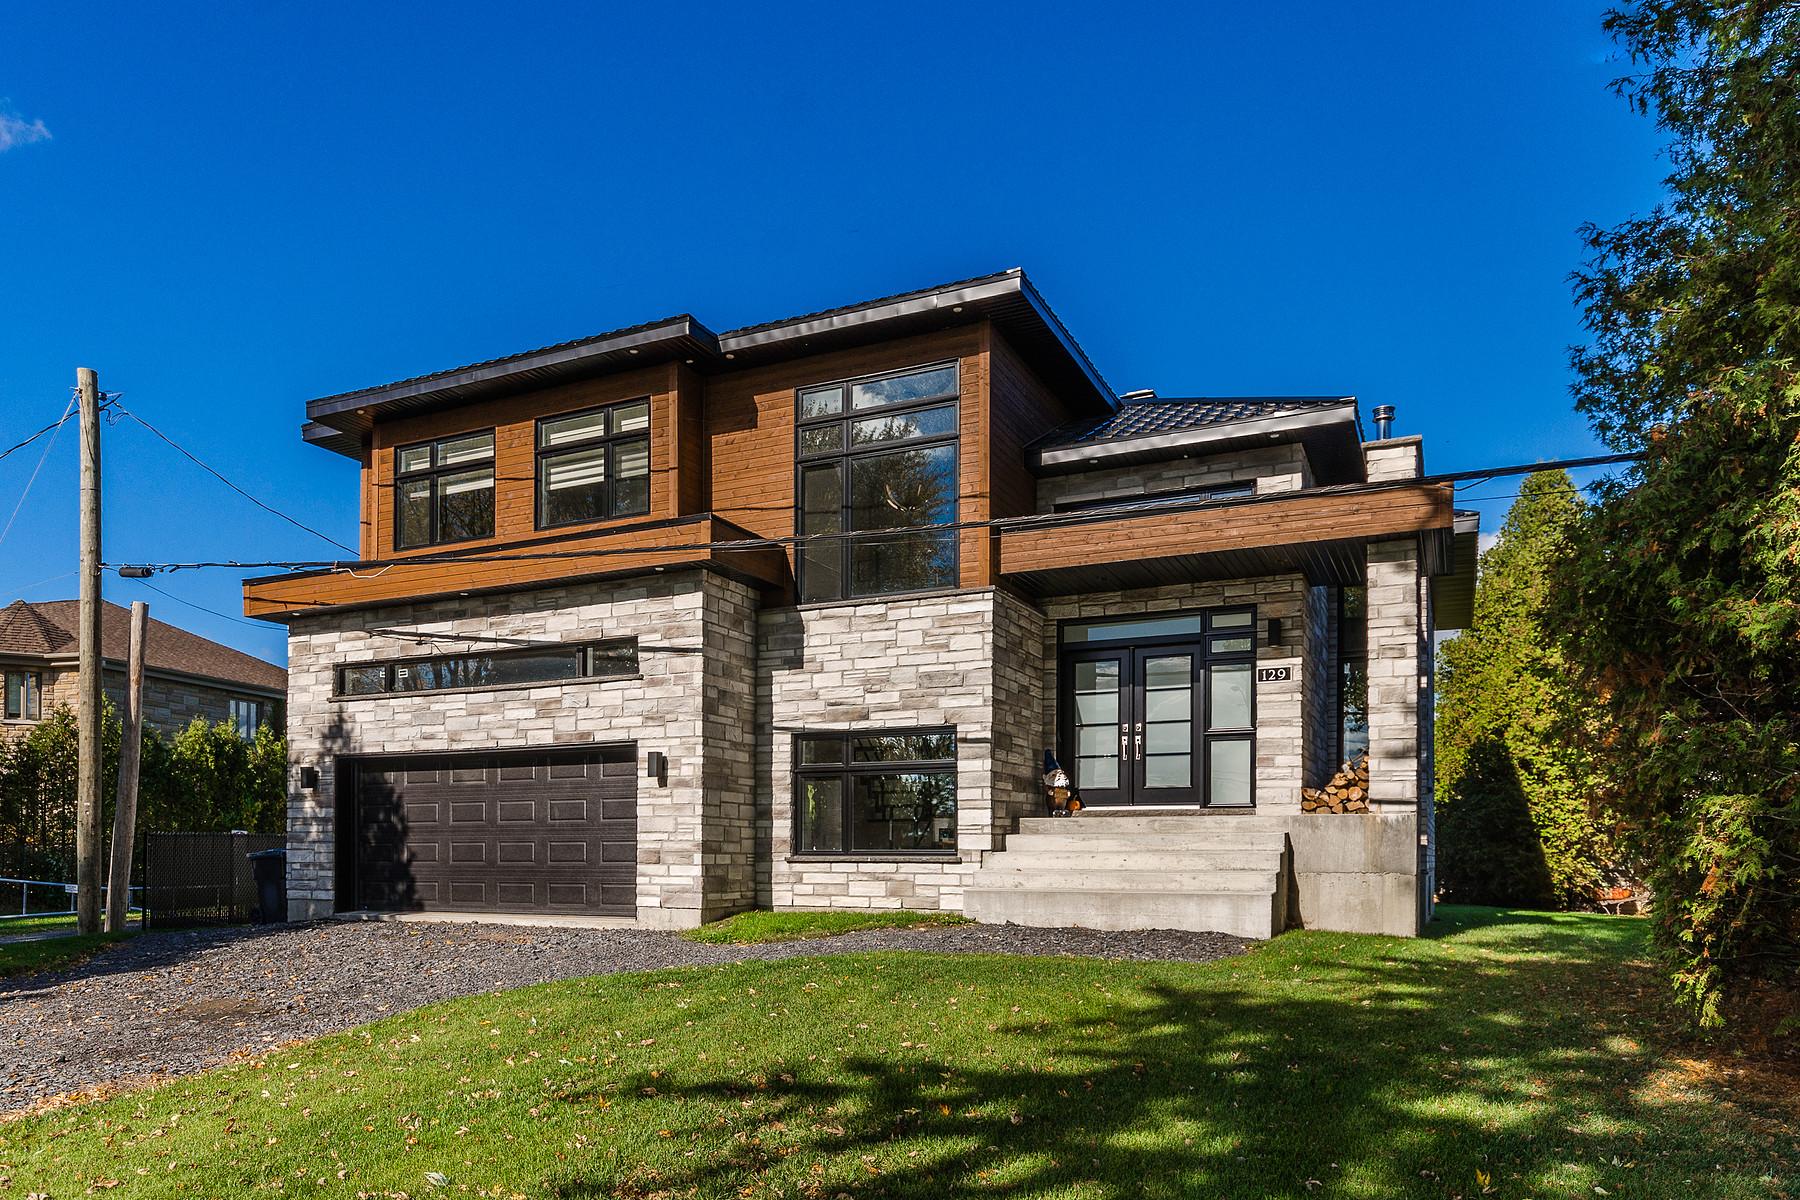 Einfamilienhaus für Verkauf beim Sainte-Barbe, Montérégie 129 Ch. du Bord-de-l'Eau Sainte-Barbe, Quebec, J0S1P0 Kanada